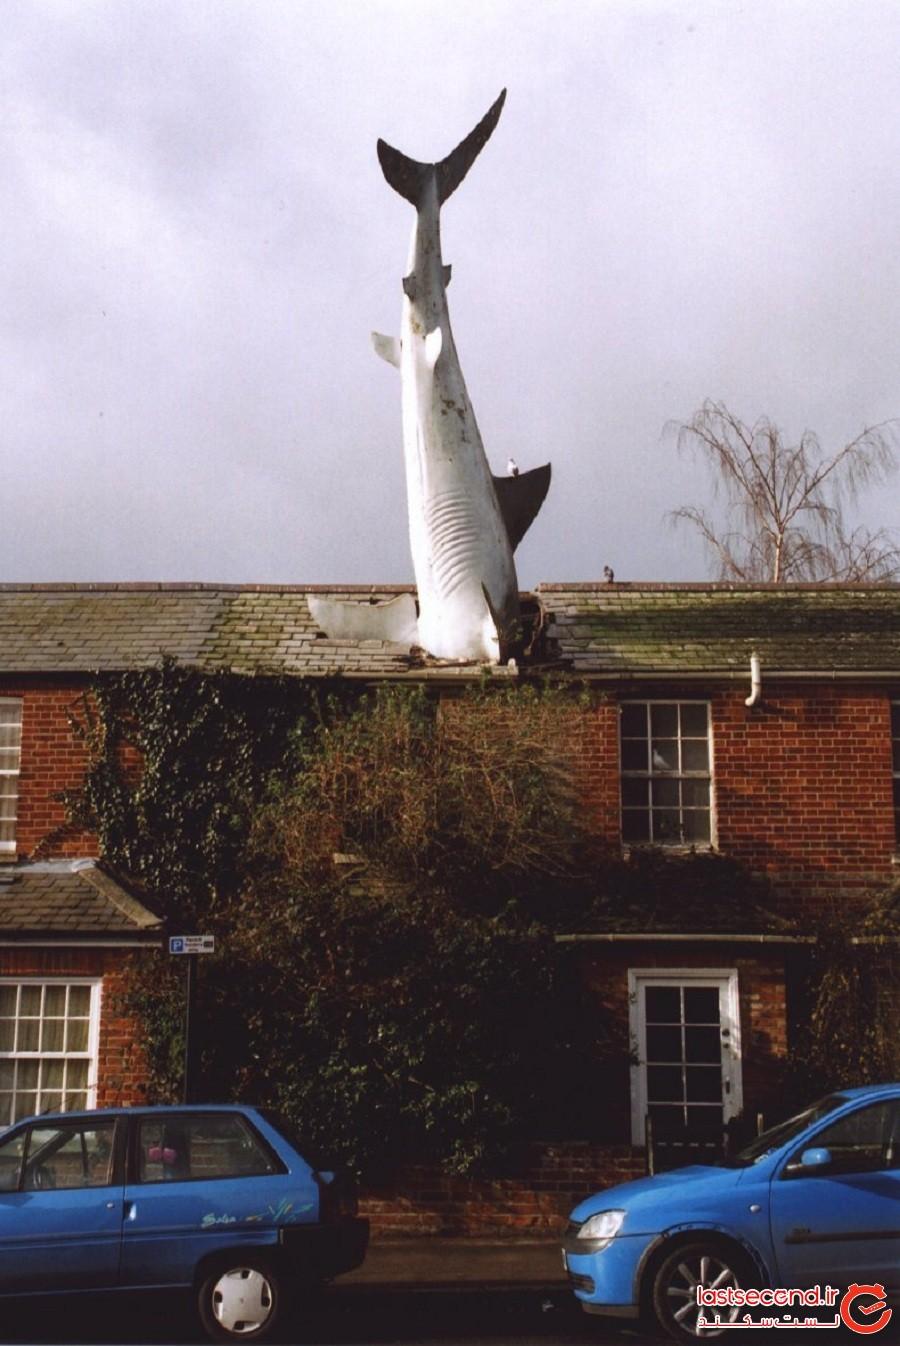 کوسه هادینگتون، شهر آکسفورد، بریتانیا